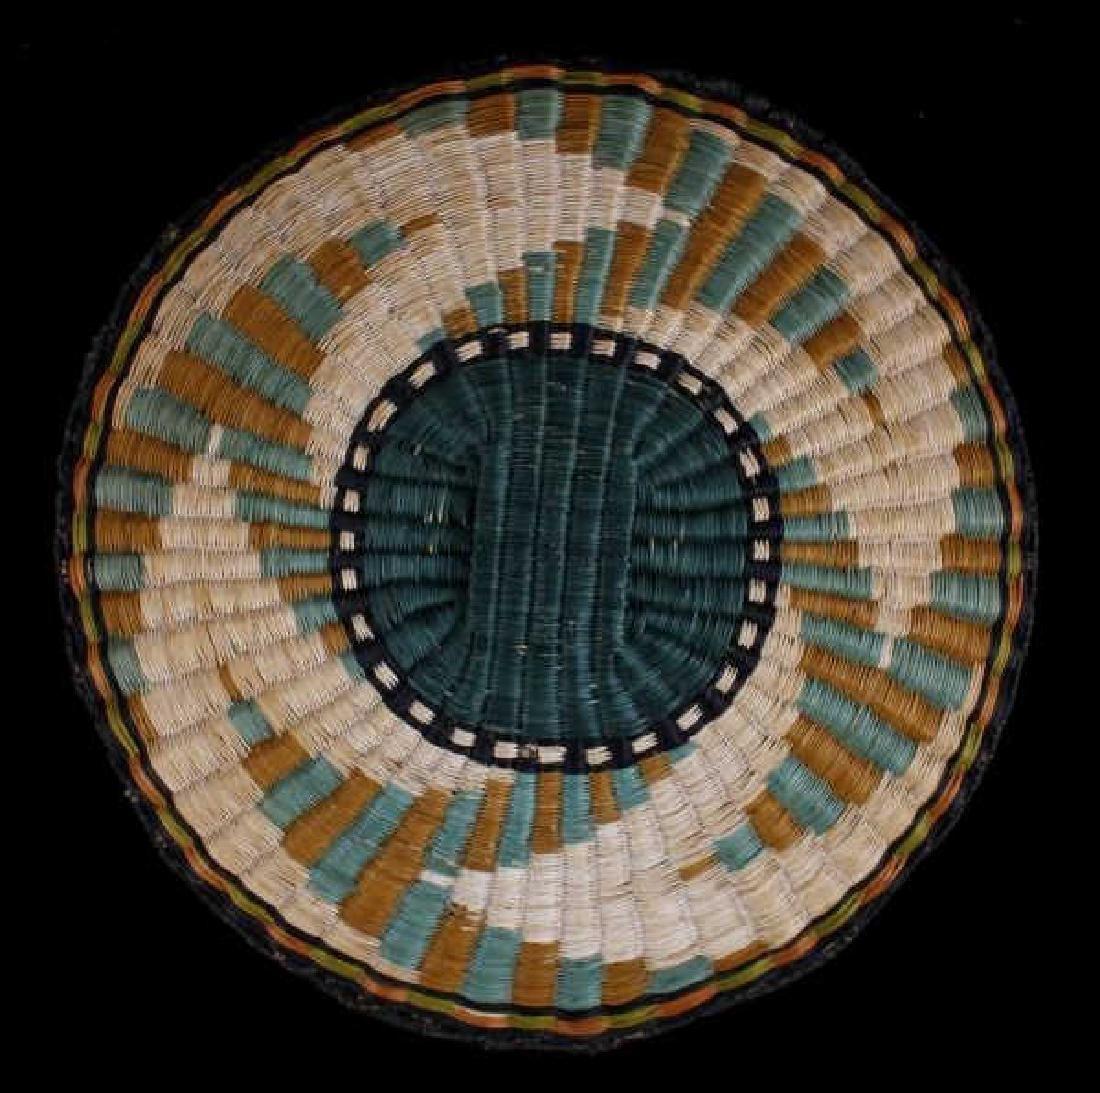 Hopi Native American Flat Weave Polychrome Baskets - 3